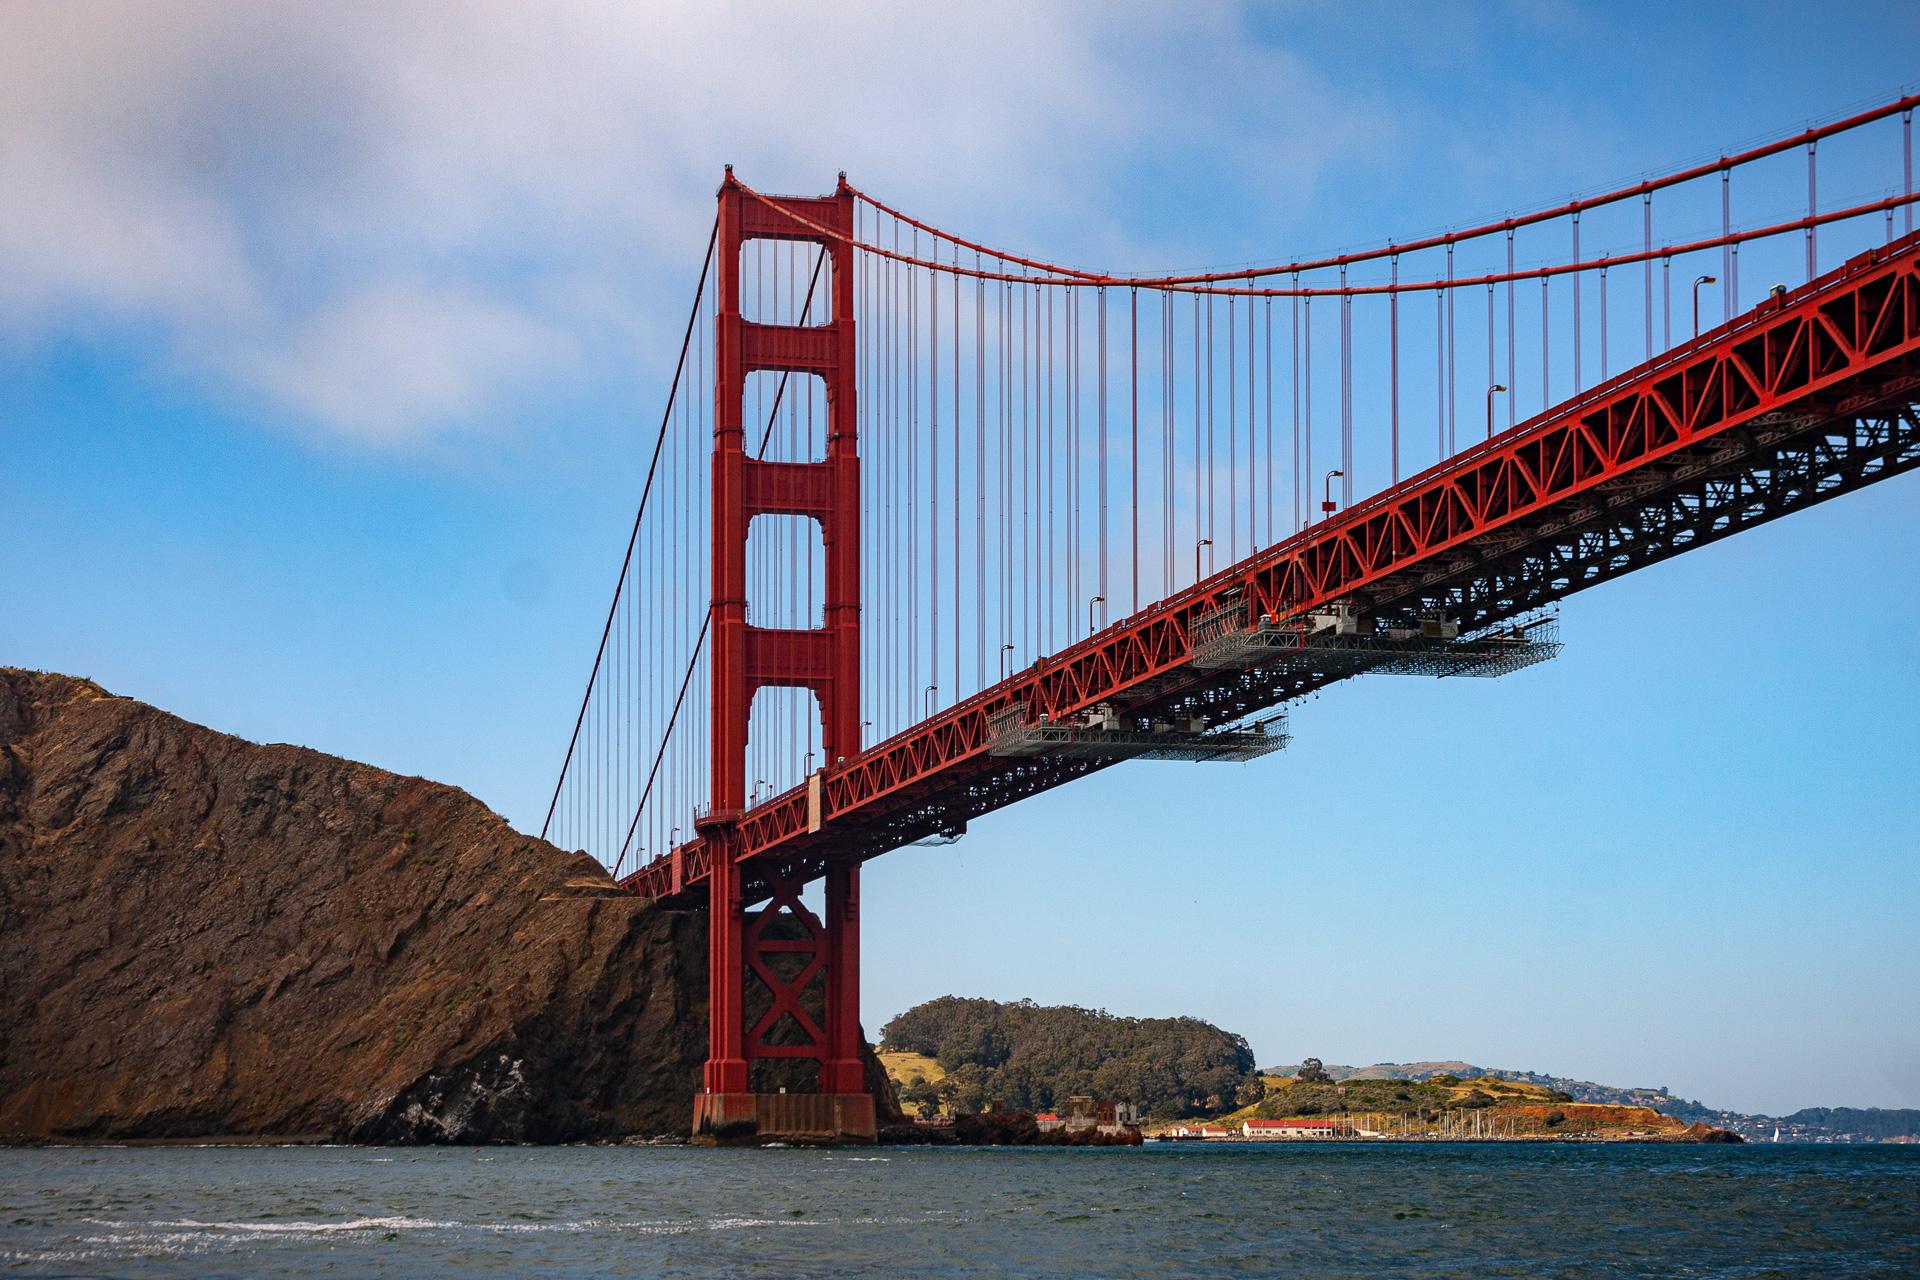 wieloryby san francisco, San Francisco i wieloryby